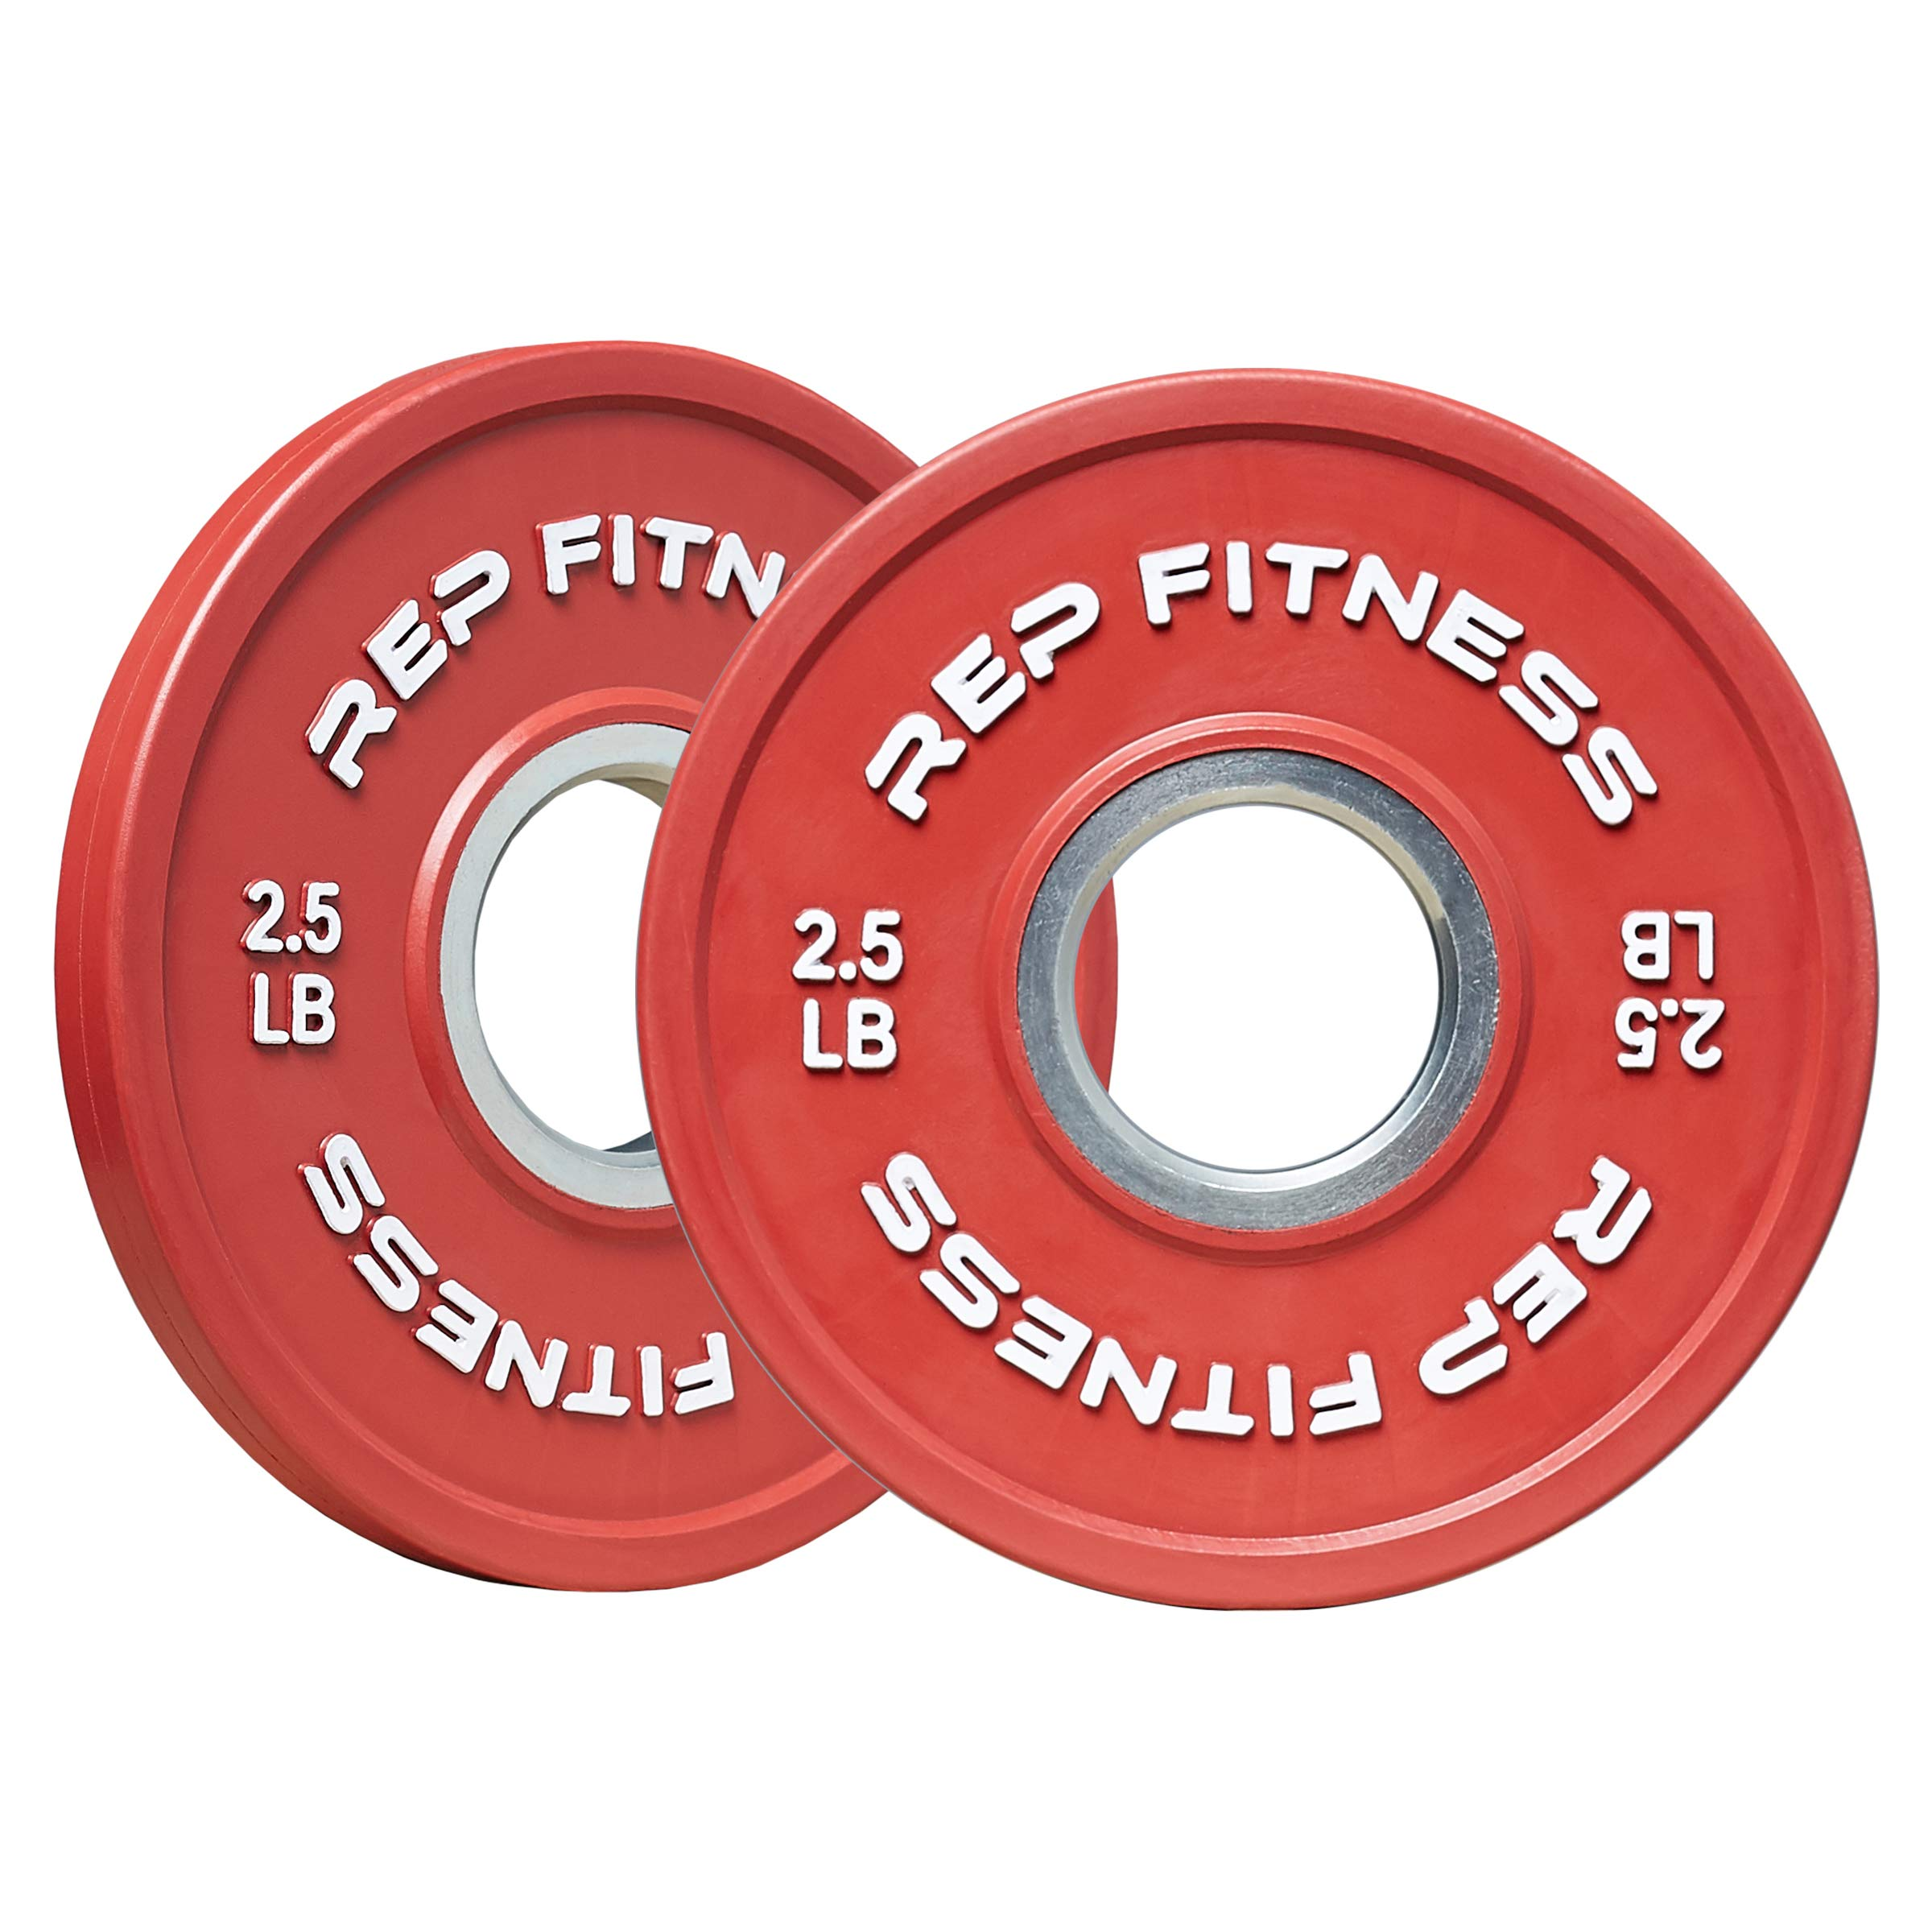 Rep Change Plates - 2.5 lb